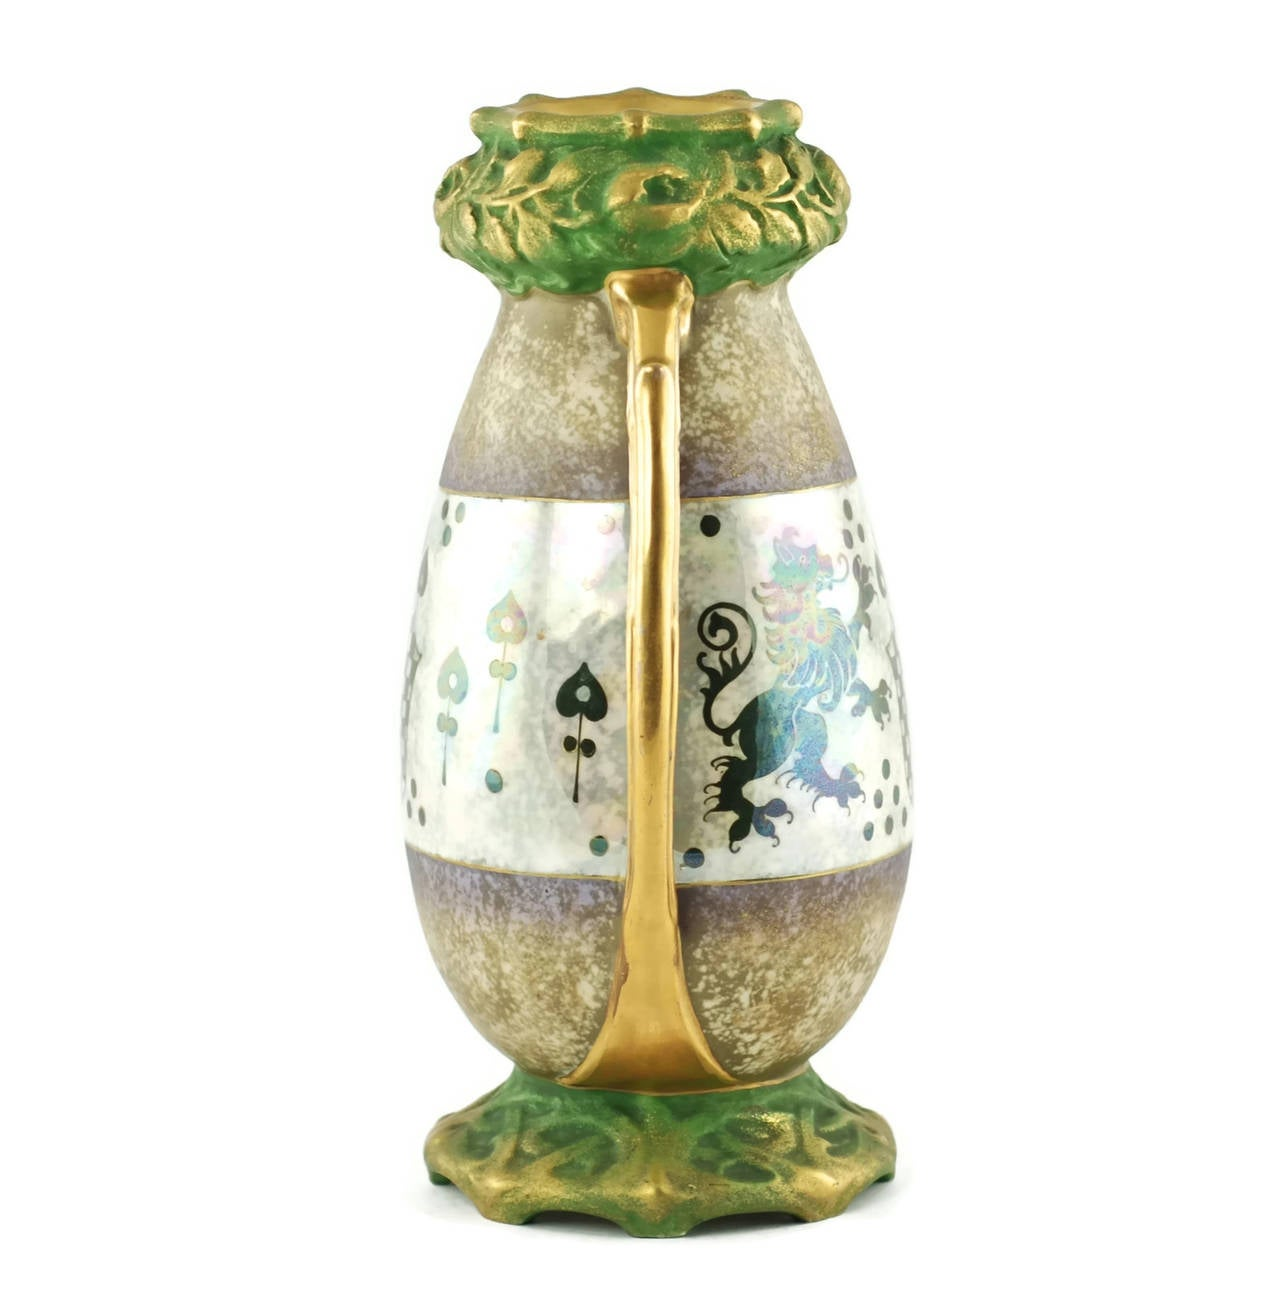 Riessner And Kessel Amphora Turn Teplitz Two Handled Vase